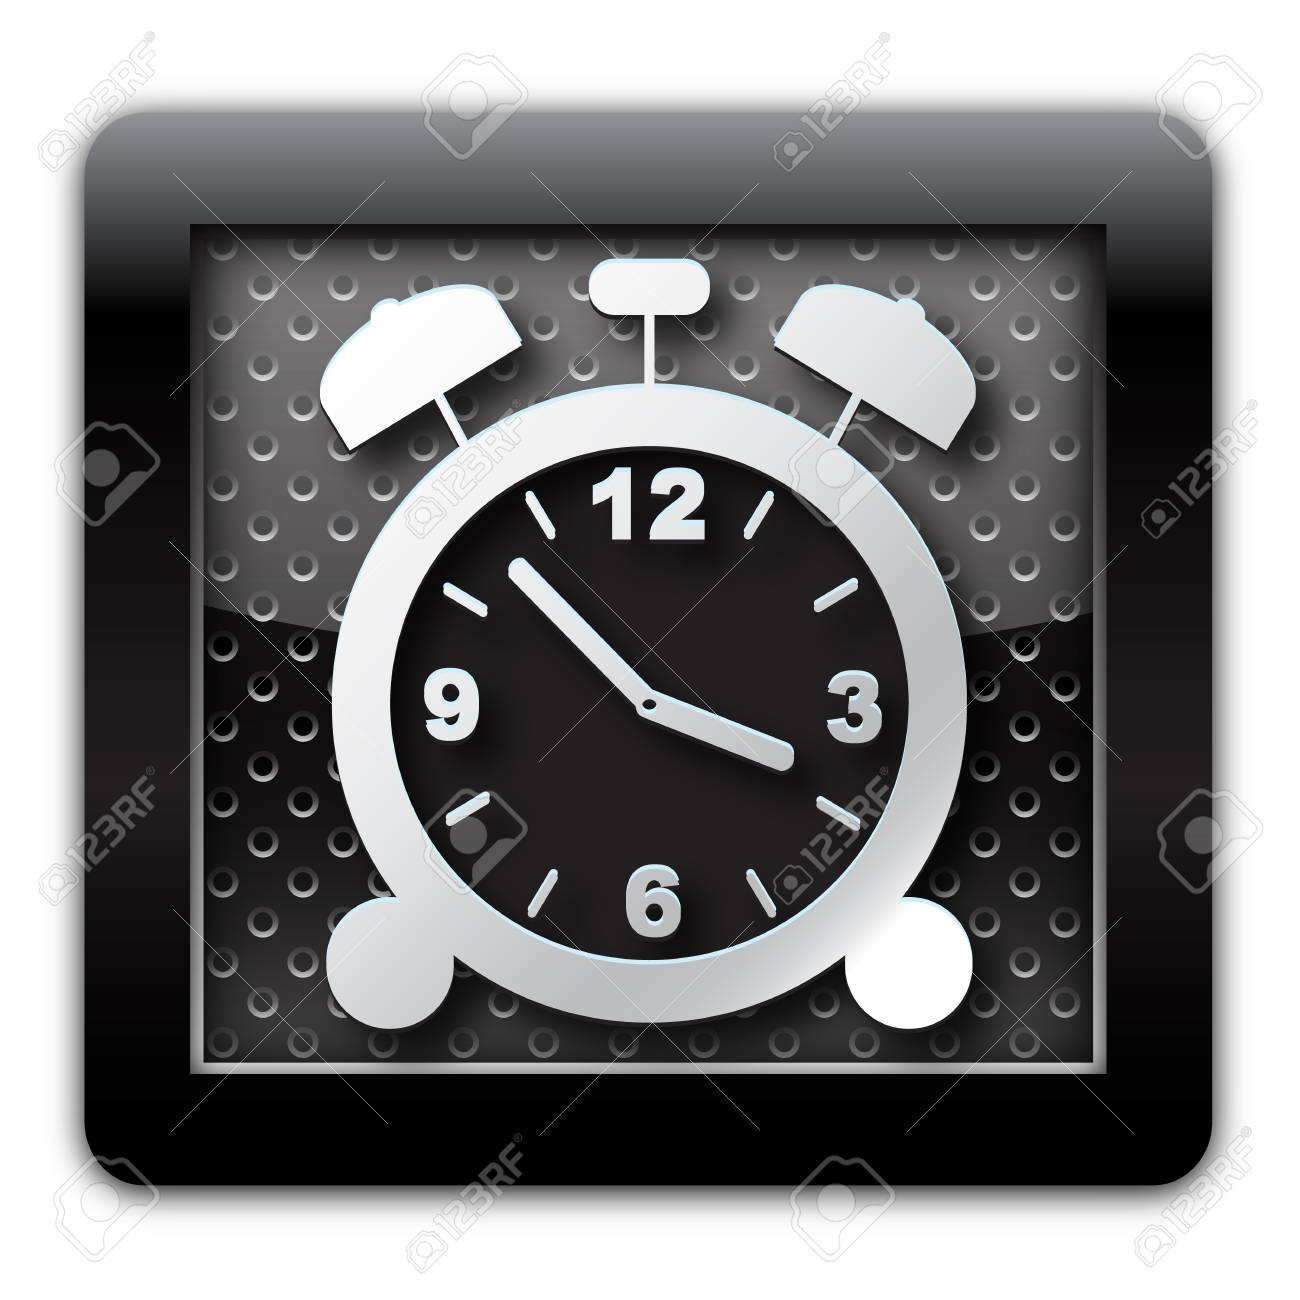 Alarm clock metallic icon Stock Photo - 11666745